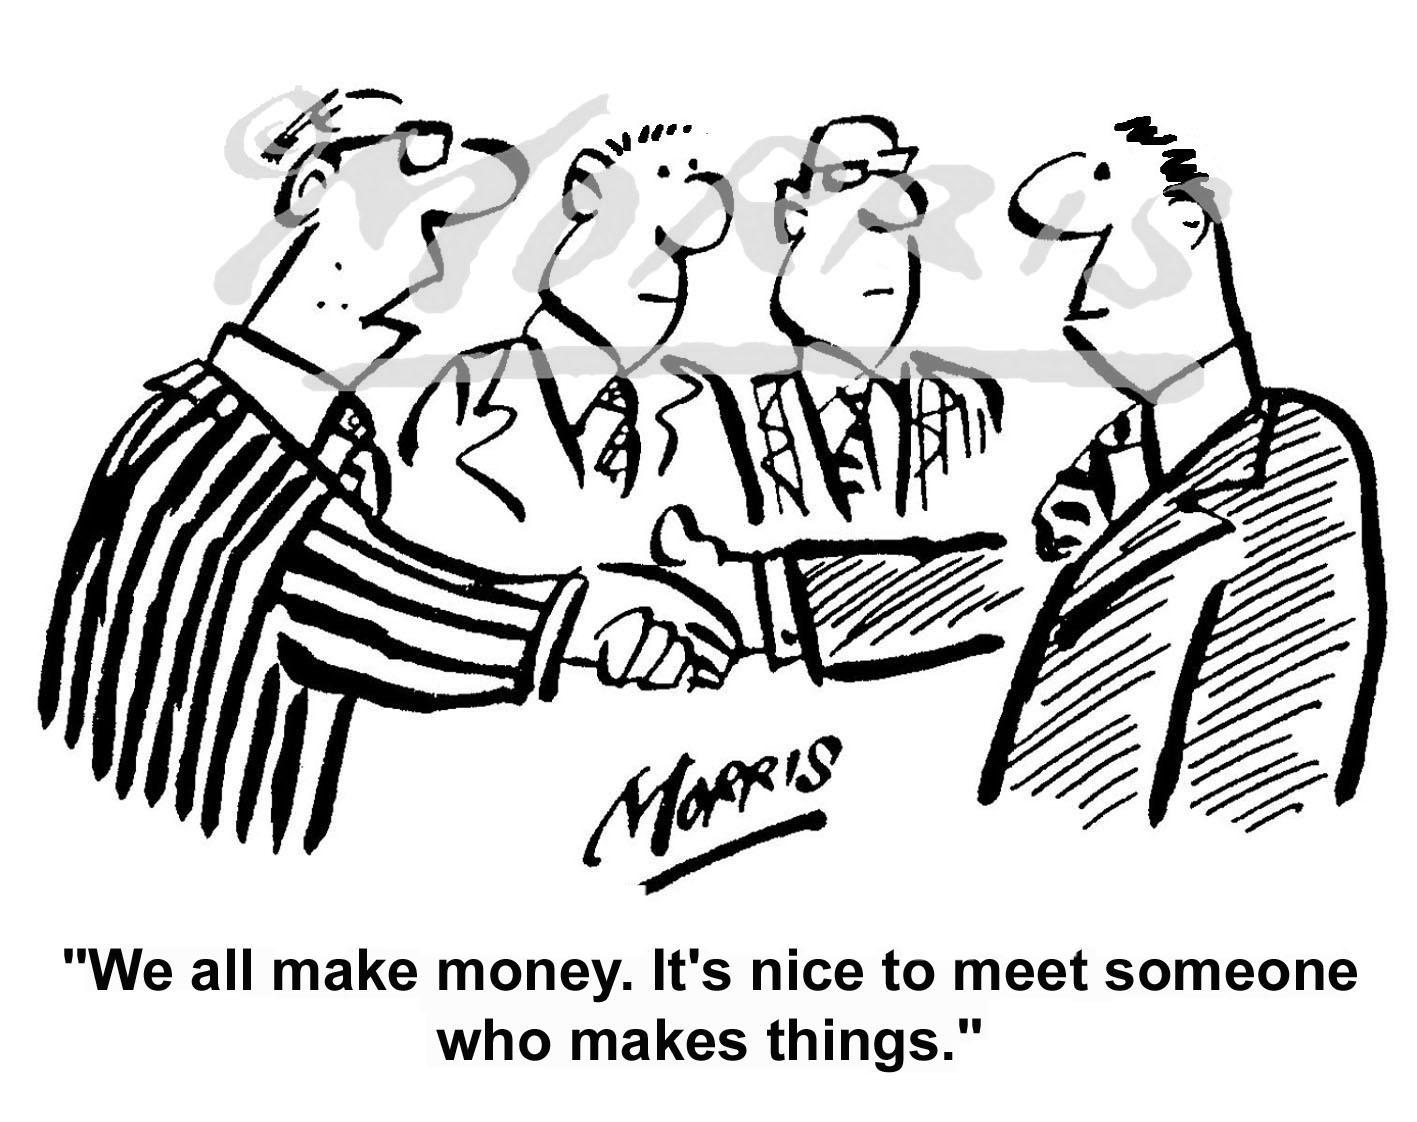 Boardroom business cartoon – Ref: 0071bw